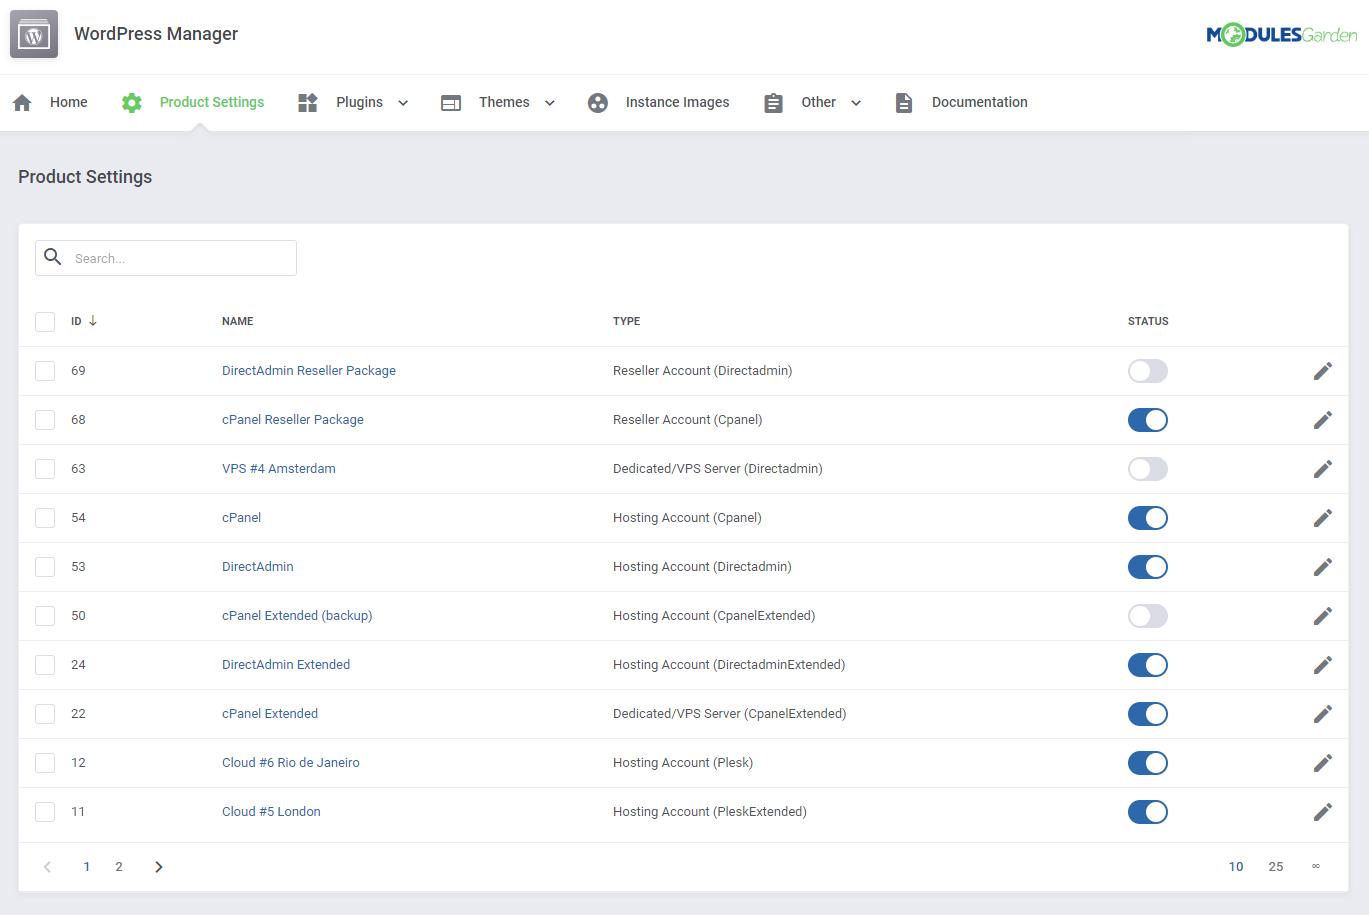 WordPress Manager For WHMCS: Module Screenshot 23